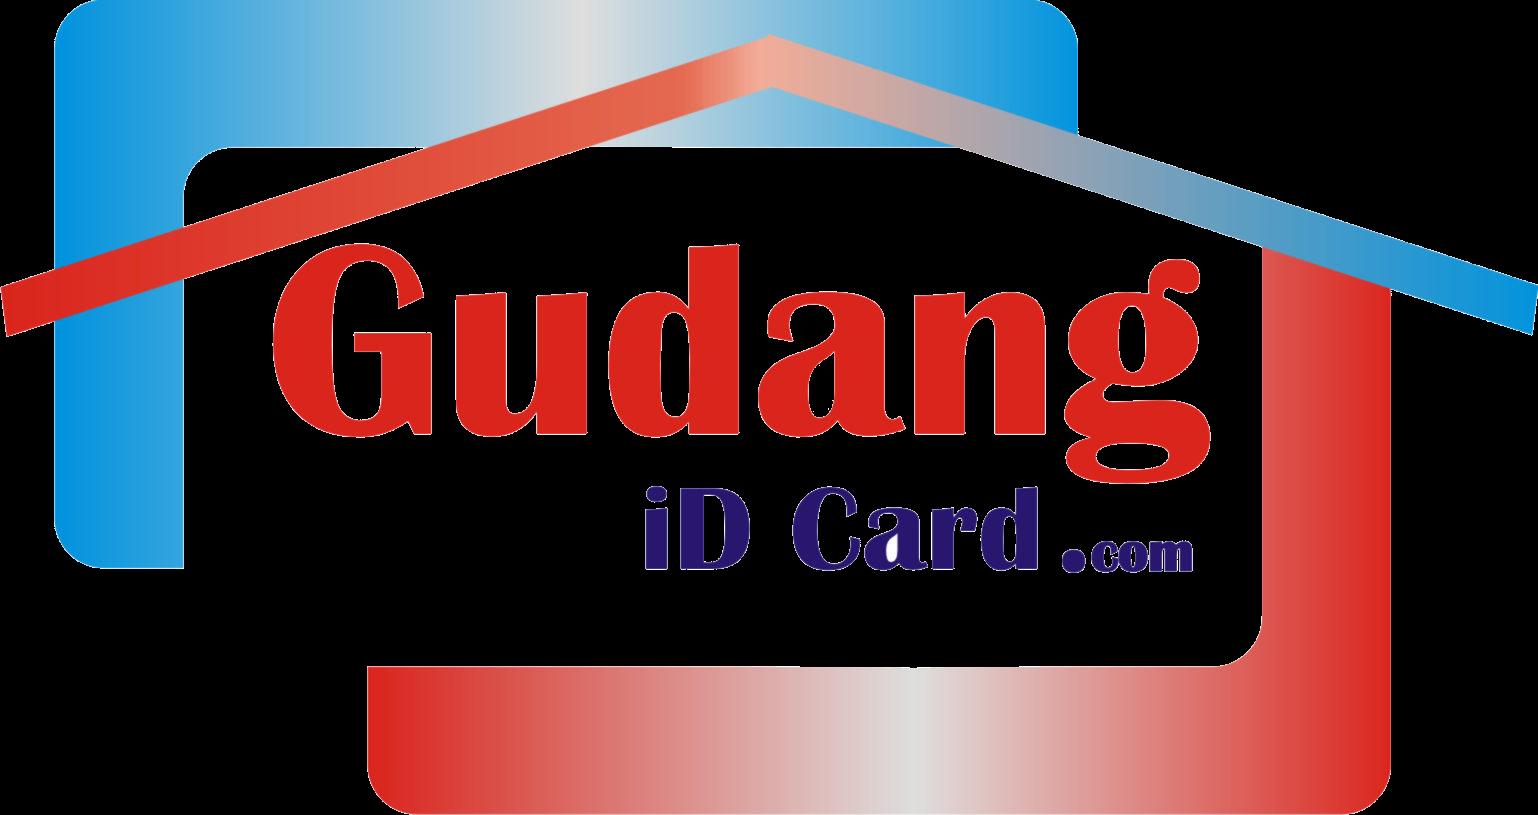 Spesialis cetak iD card